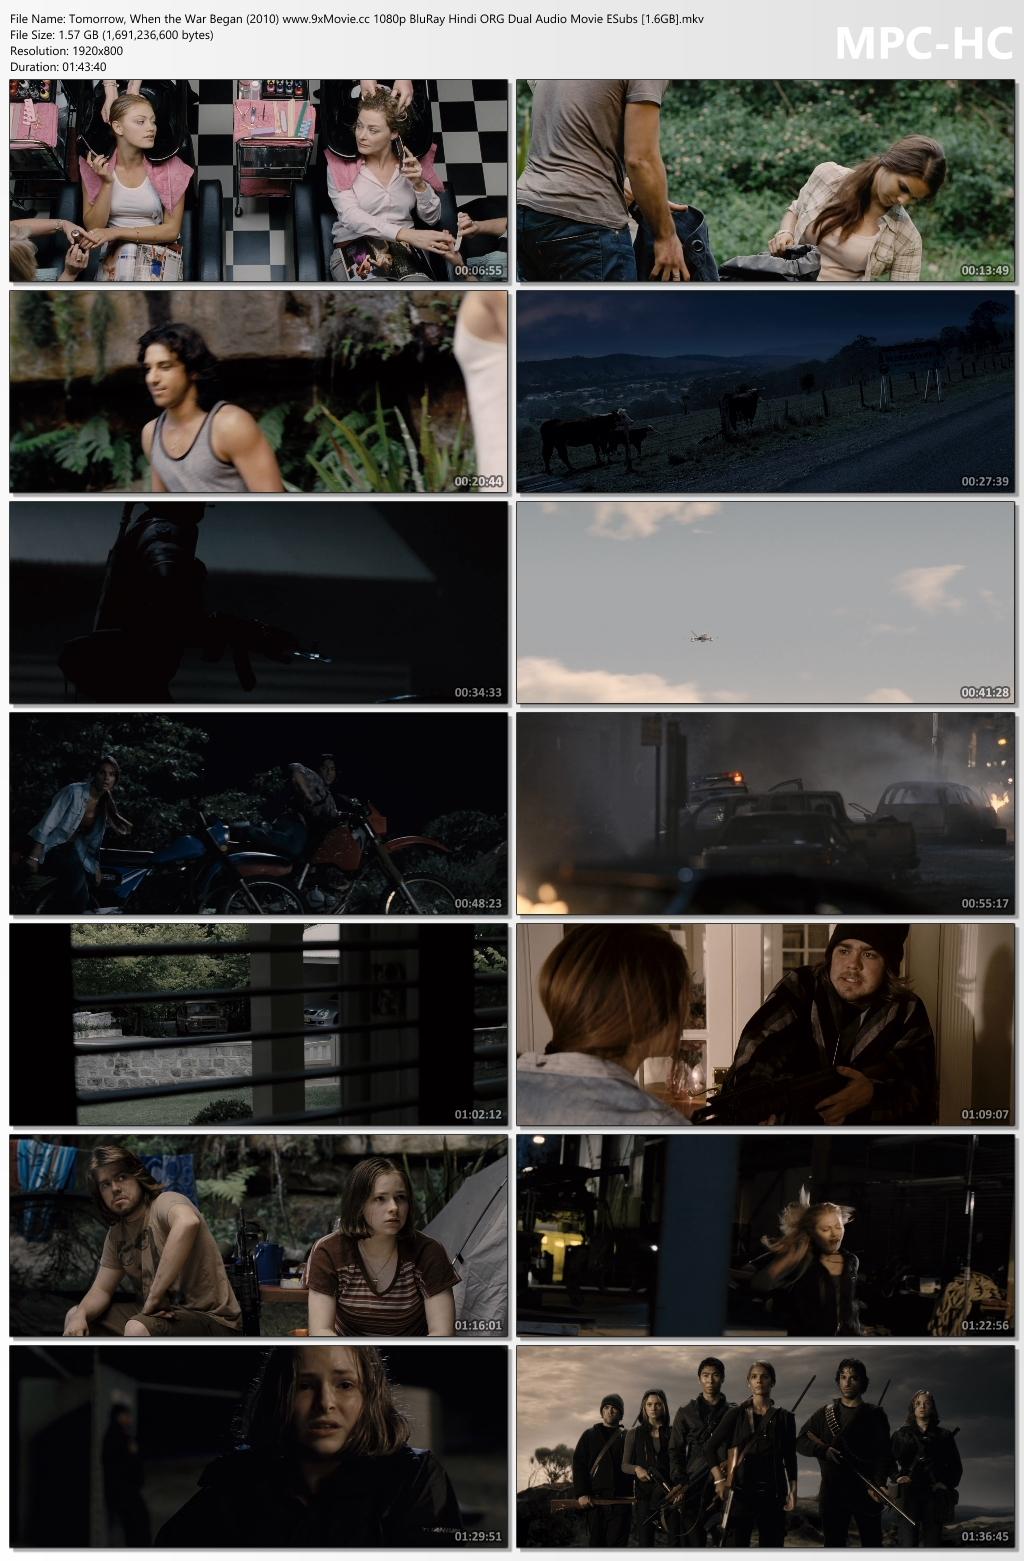 Tomorrow-When-the-War-Began-2010-www-9x-Movie-cc-1080p-Blu-Ray-Hindi-ORG-Dual-Audio-Movie-ESubs-1-6-